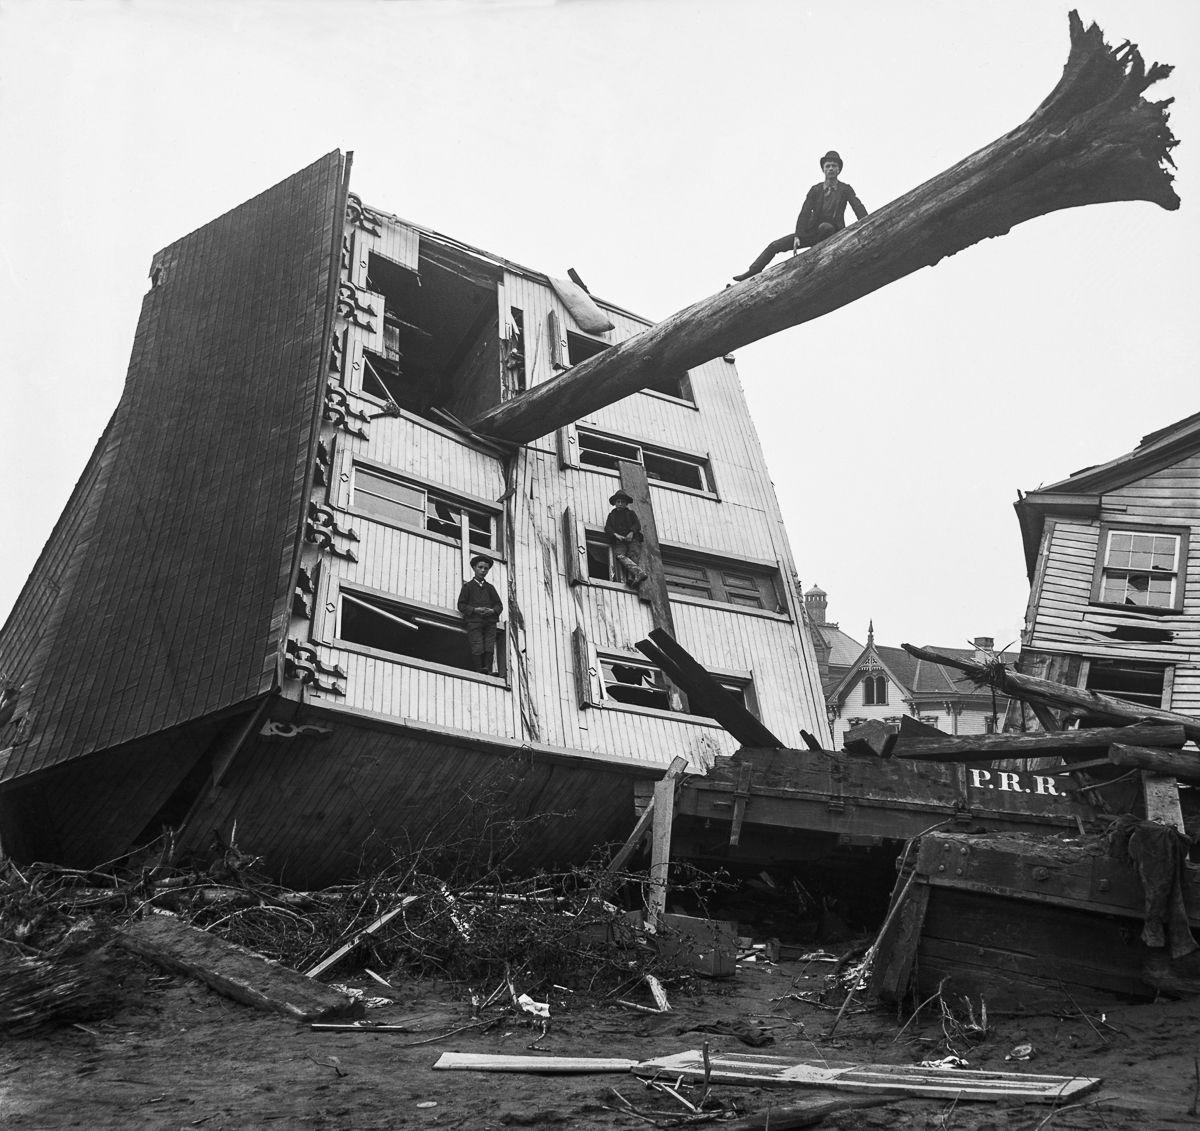 The Devastating 1889 Johnstown Flood Killed Over 2,000 People in Minutes